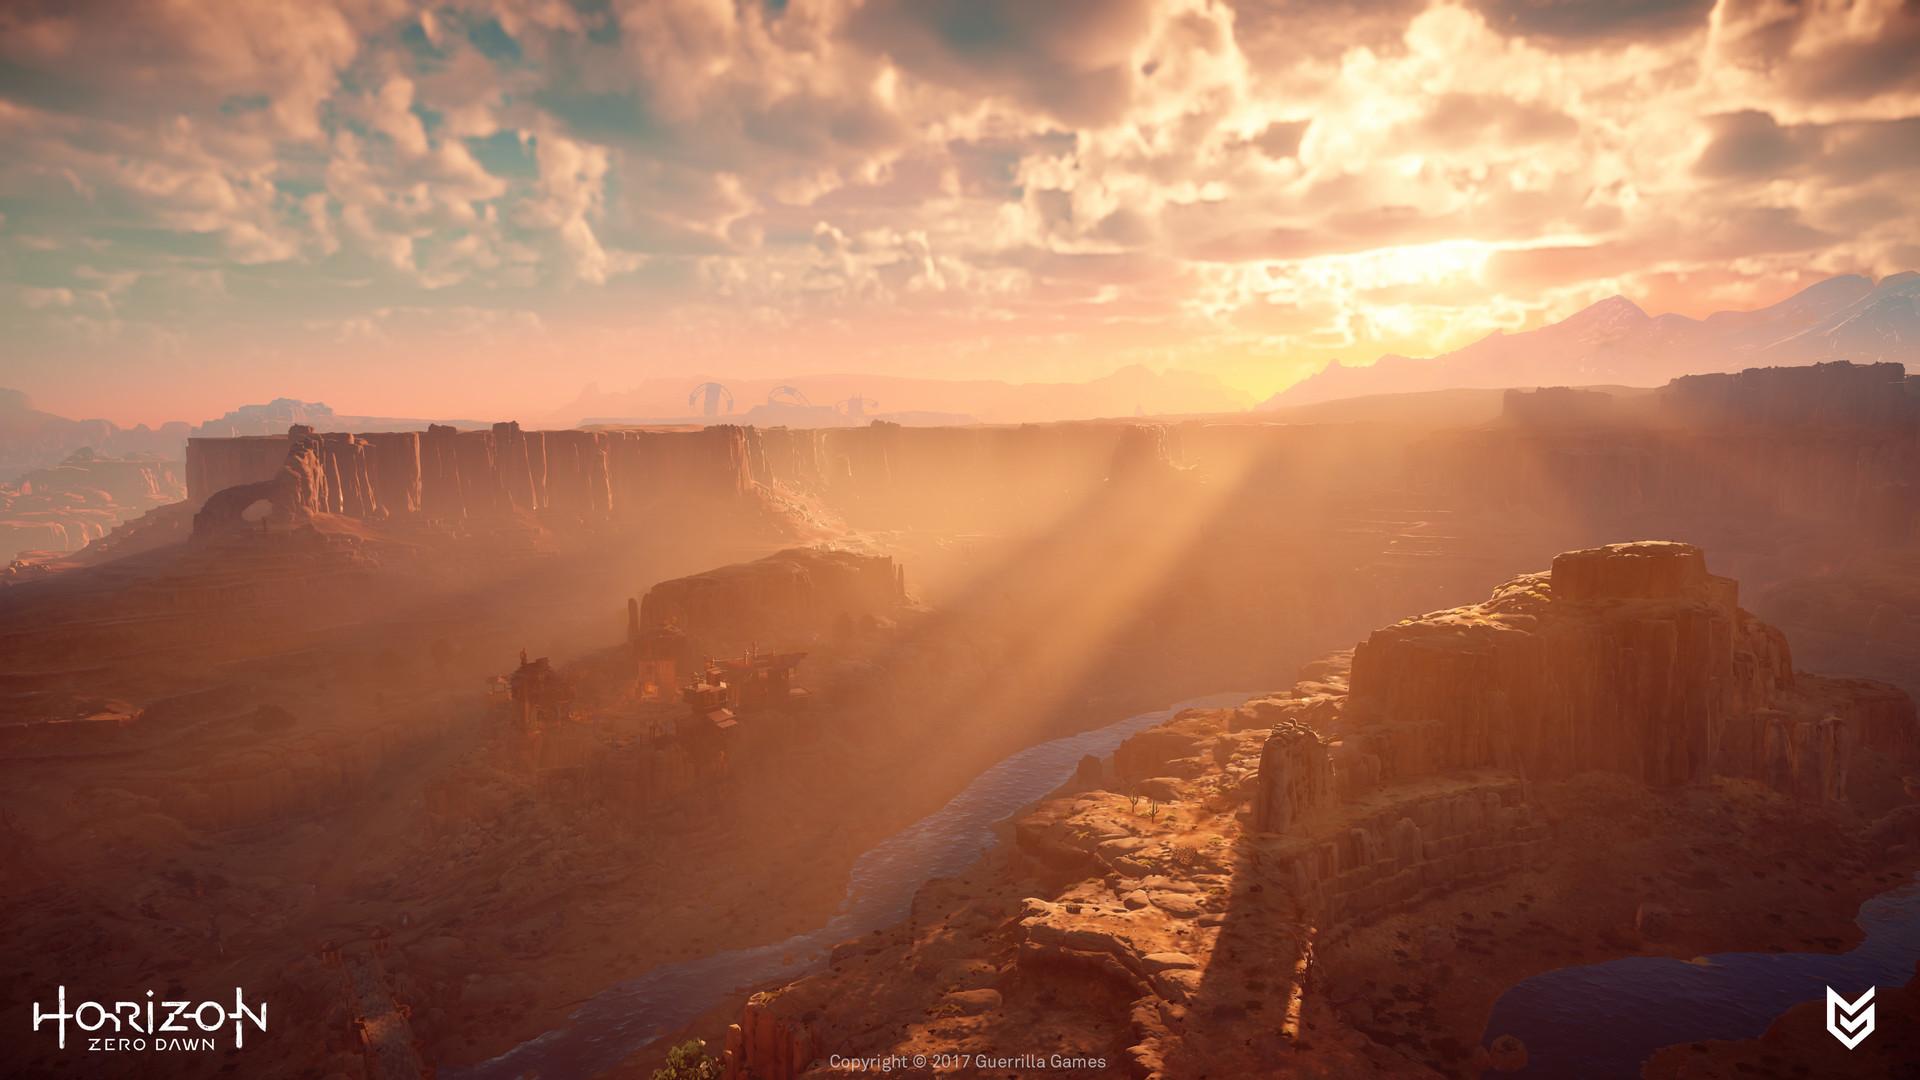 Lukas kolz sun carja lands with view on lone light